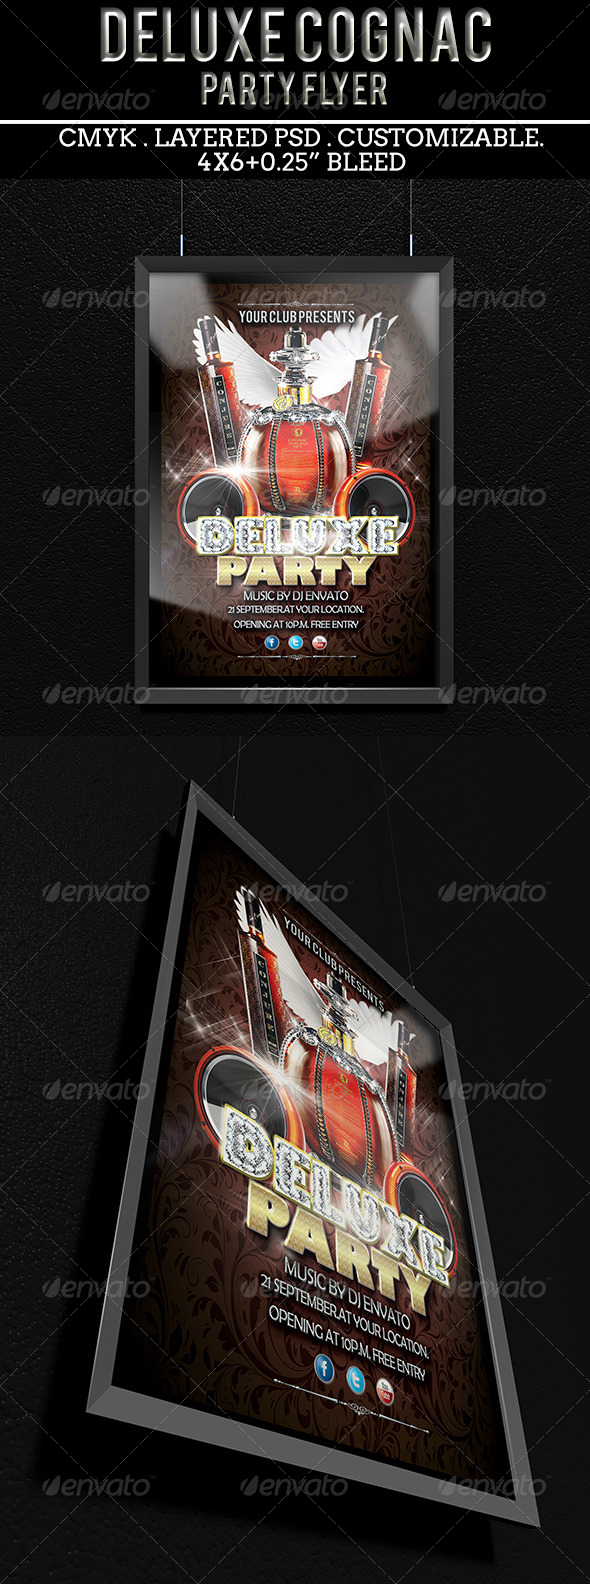 GraphicRiver Deluxe Cognac Party Flyer 5525117